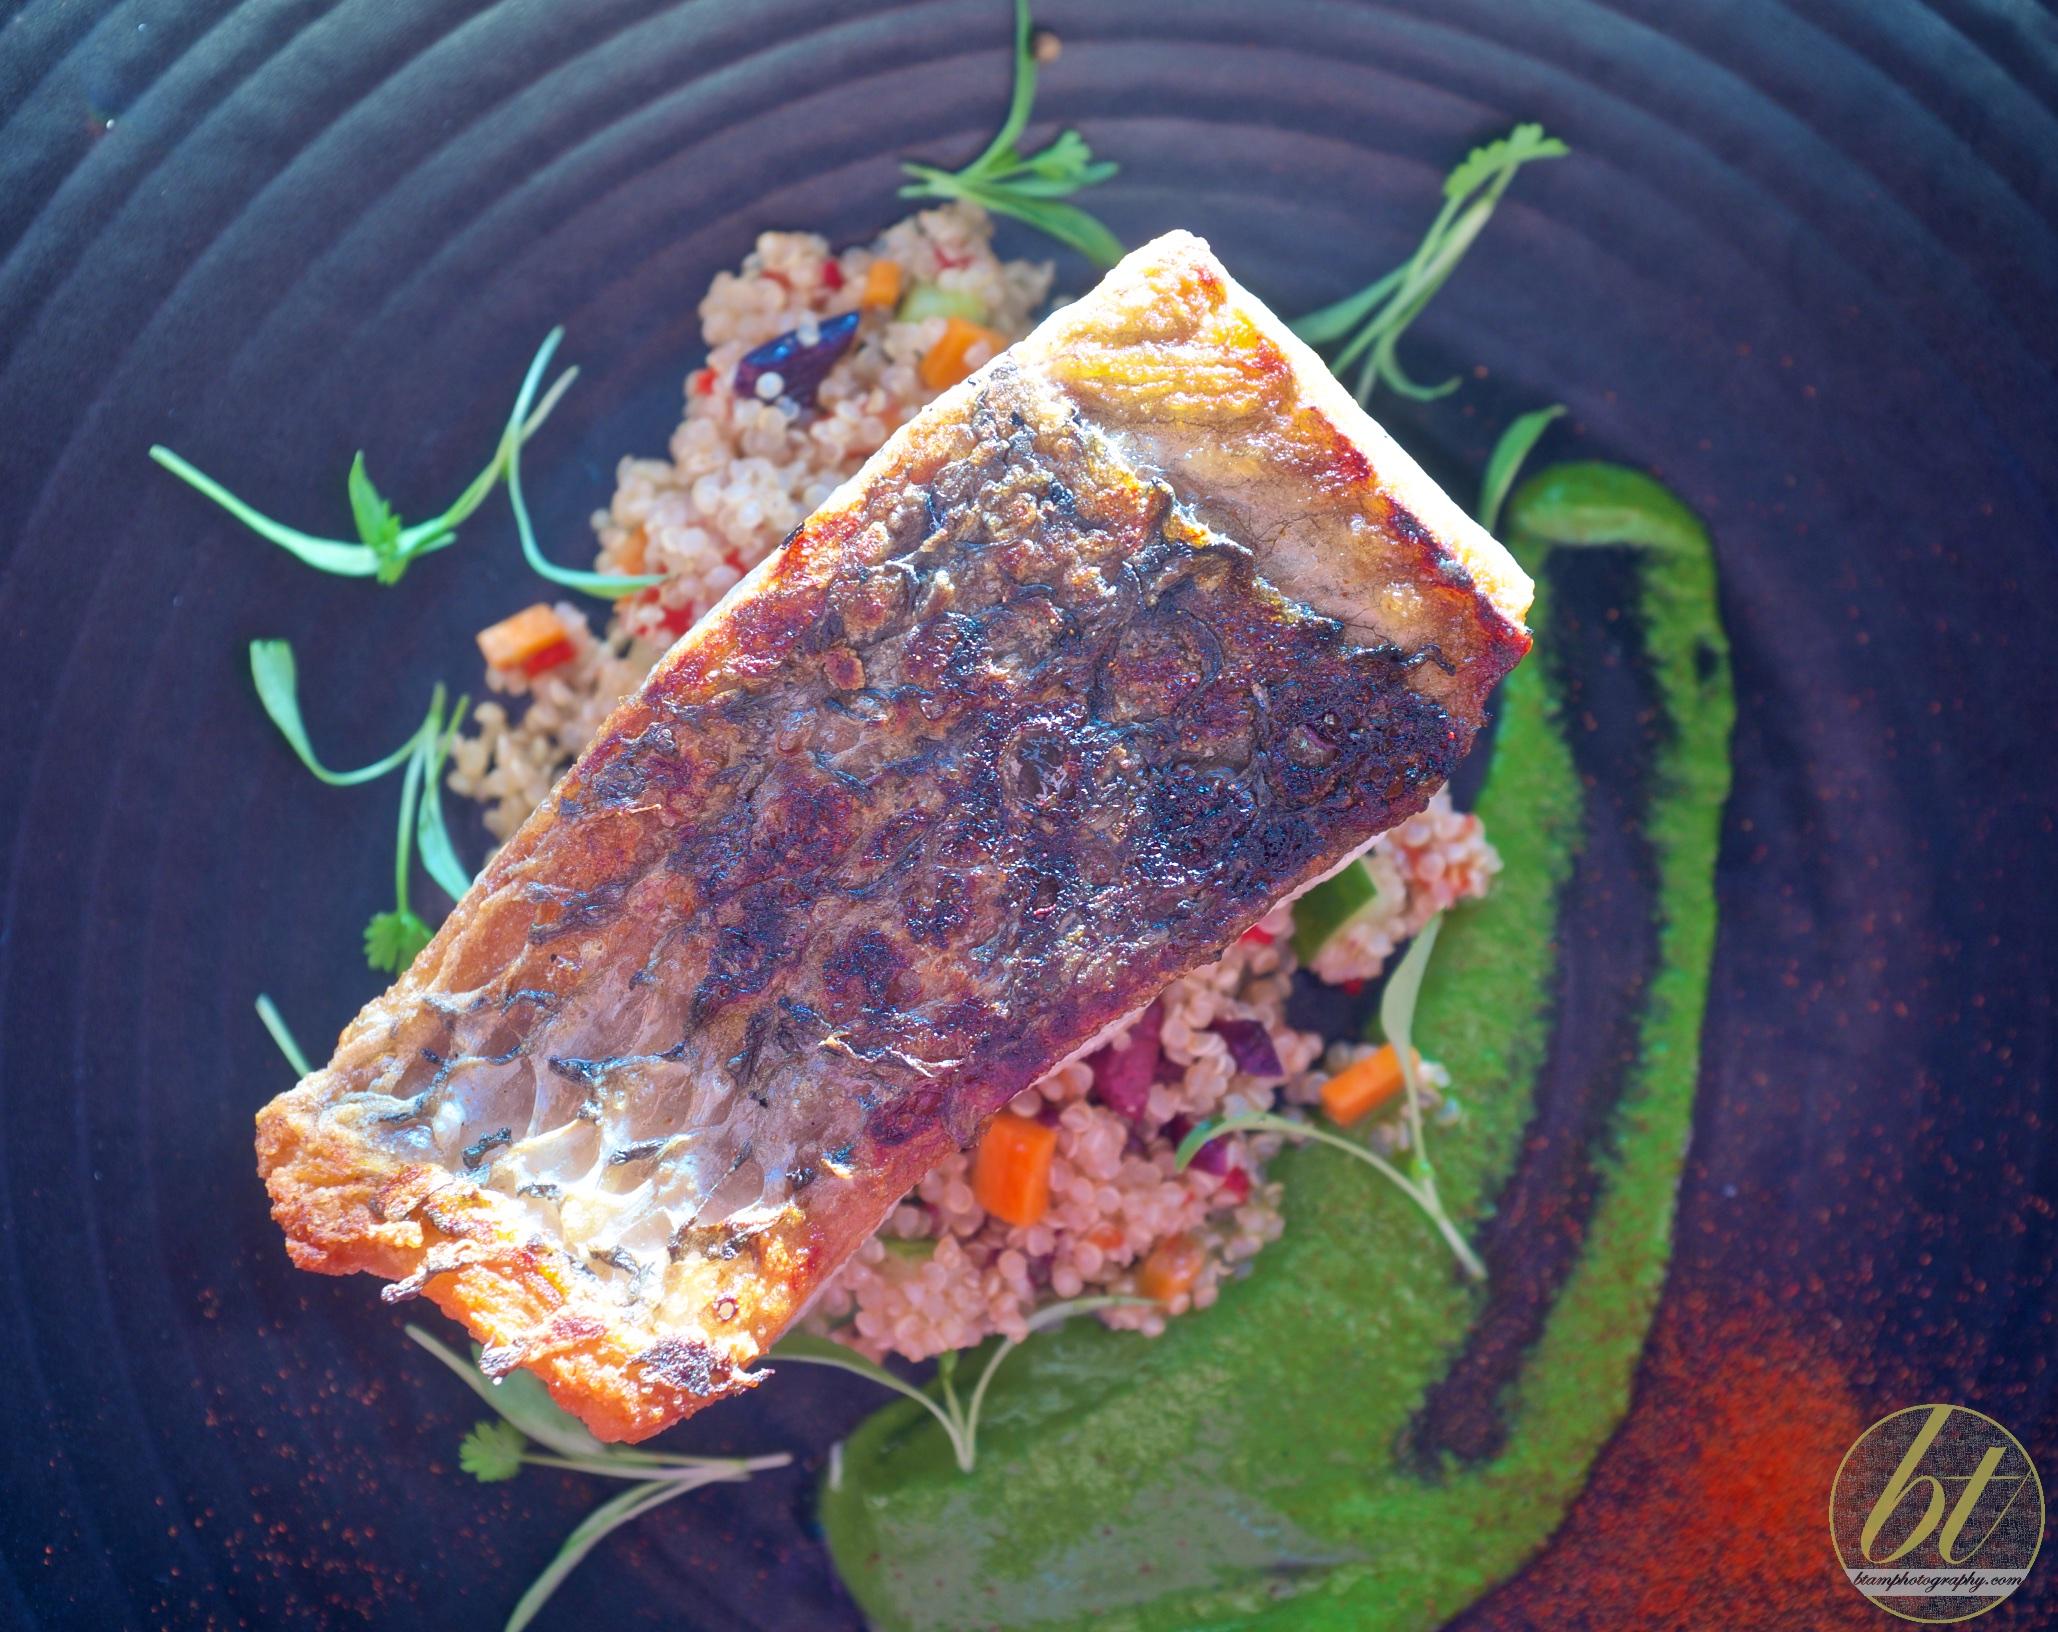 Barramundi with quinoa salad, cucumber, carrot, black olive and cilantro pesto ($32)